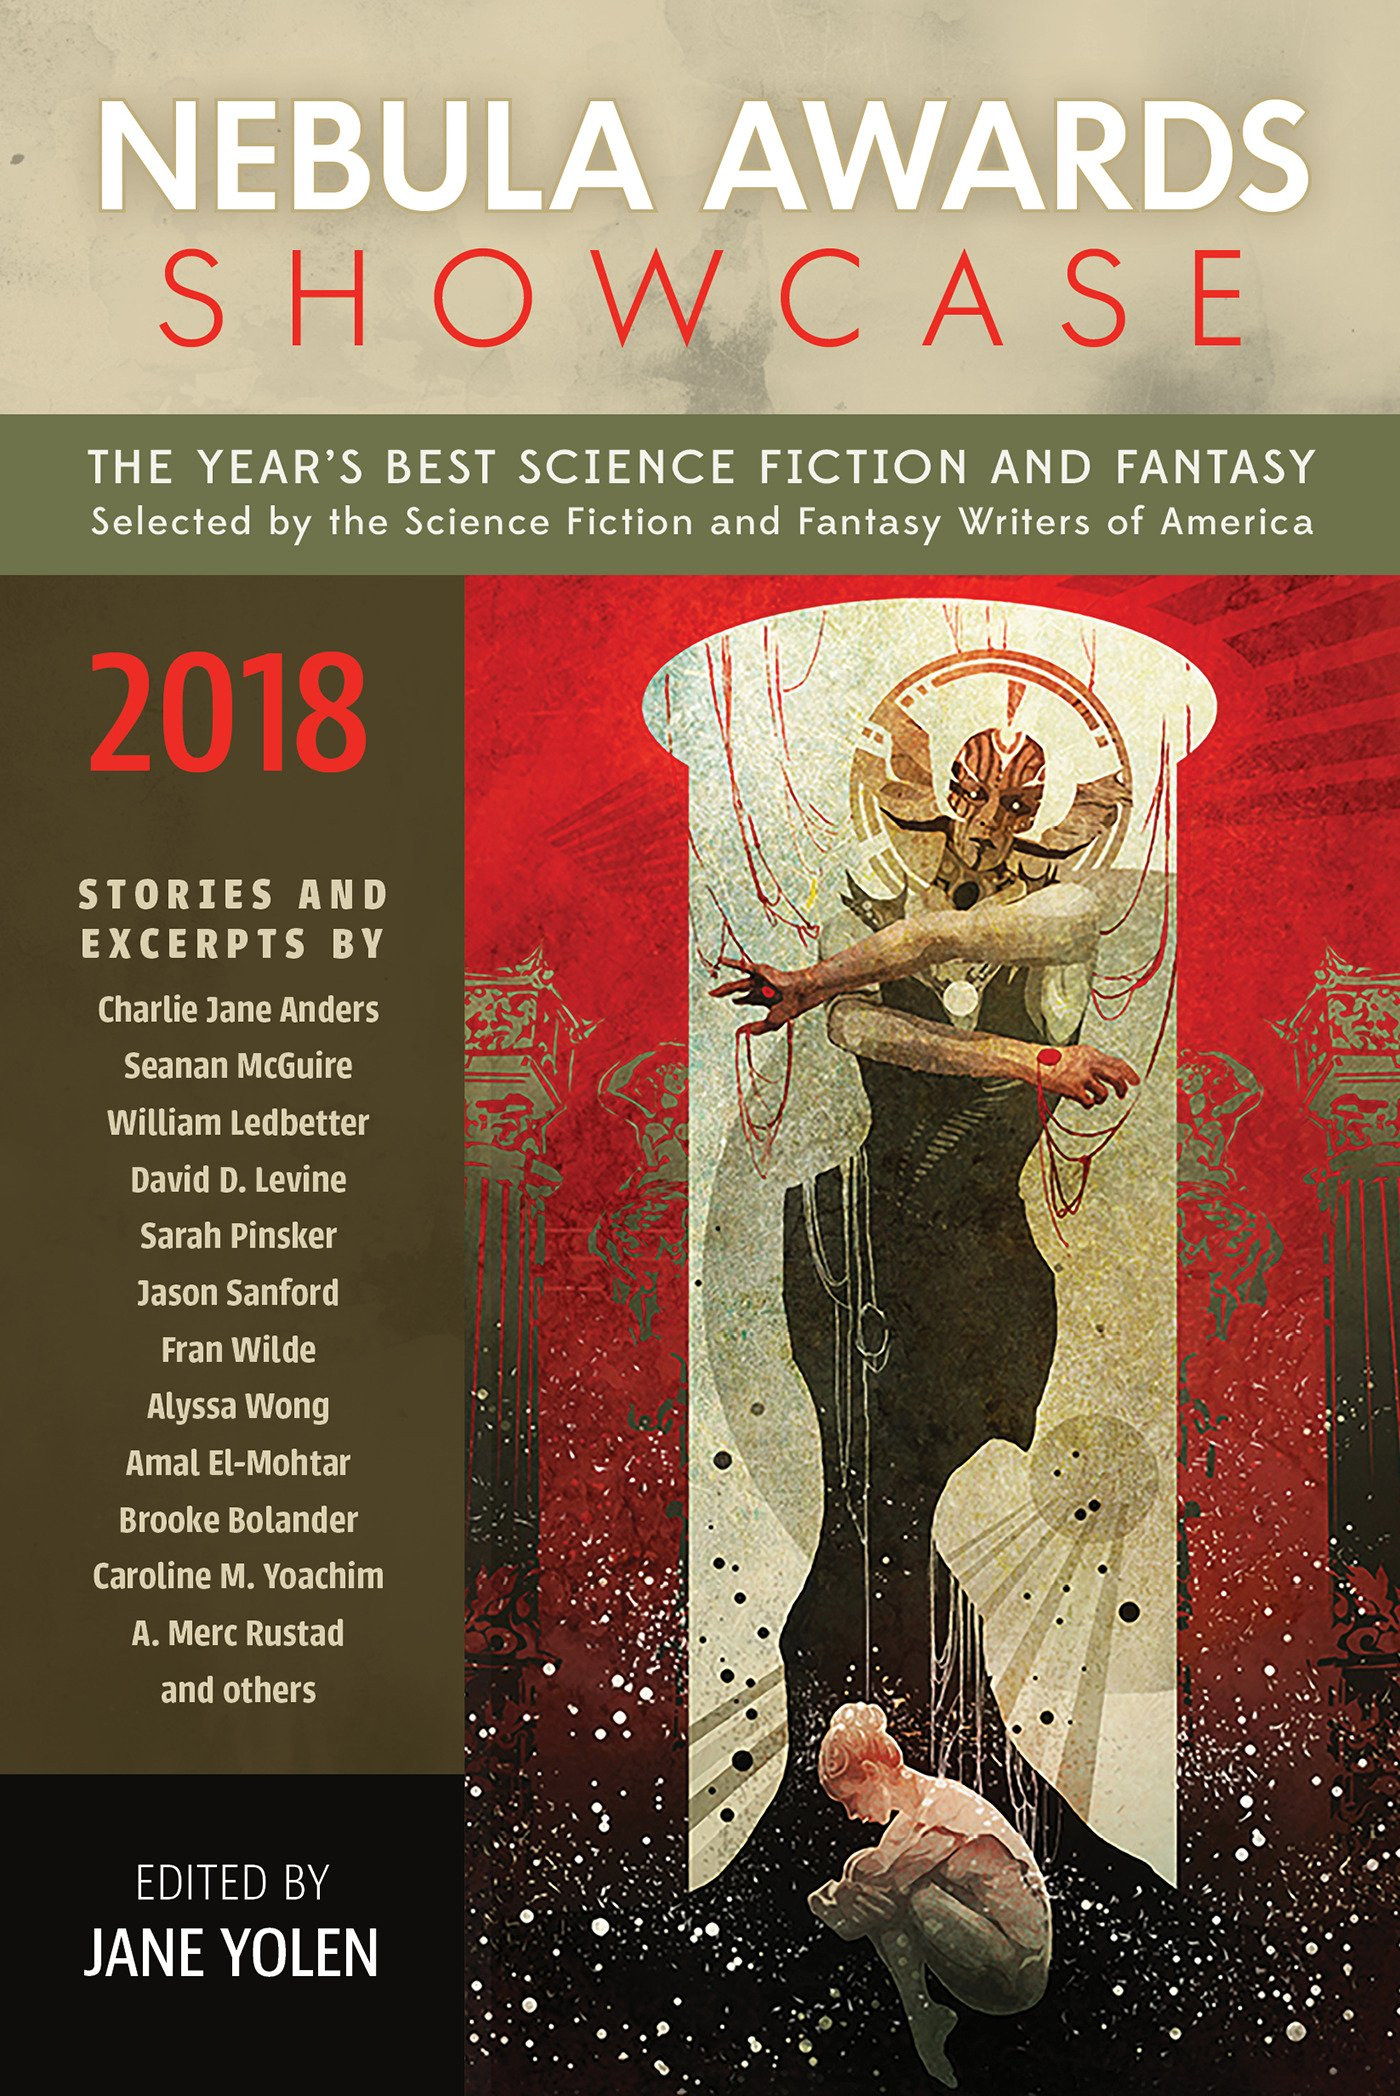 Nebula Awards Showcase 2018 book review | Sci-Fi Movie Page